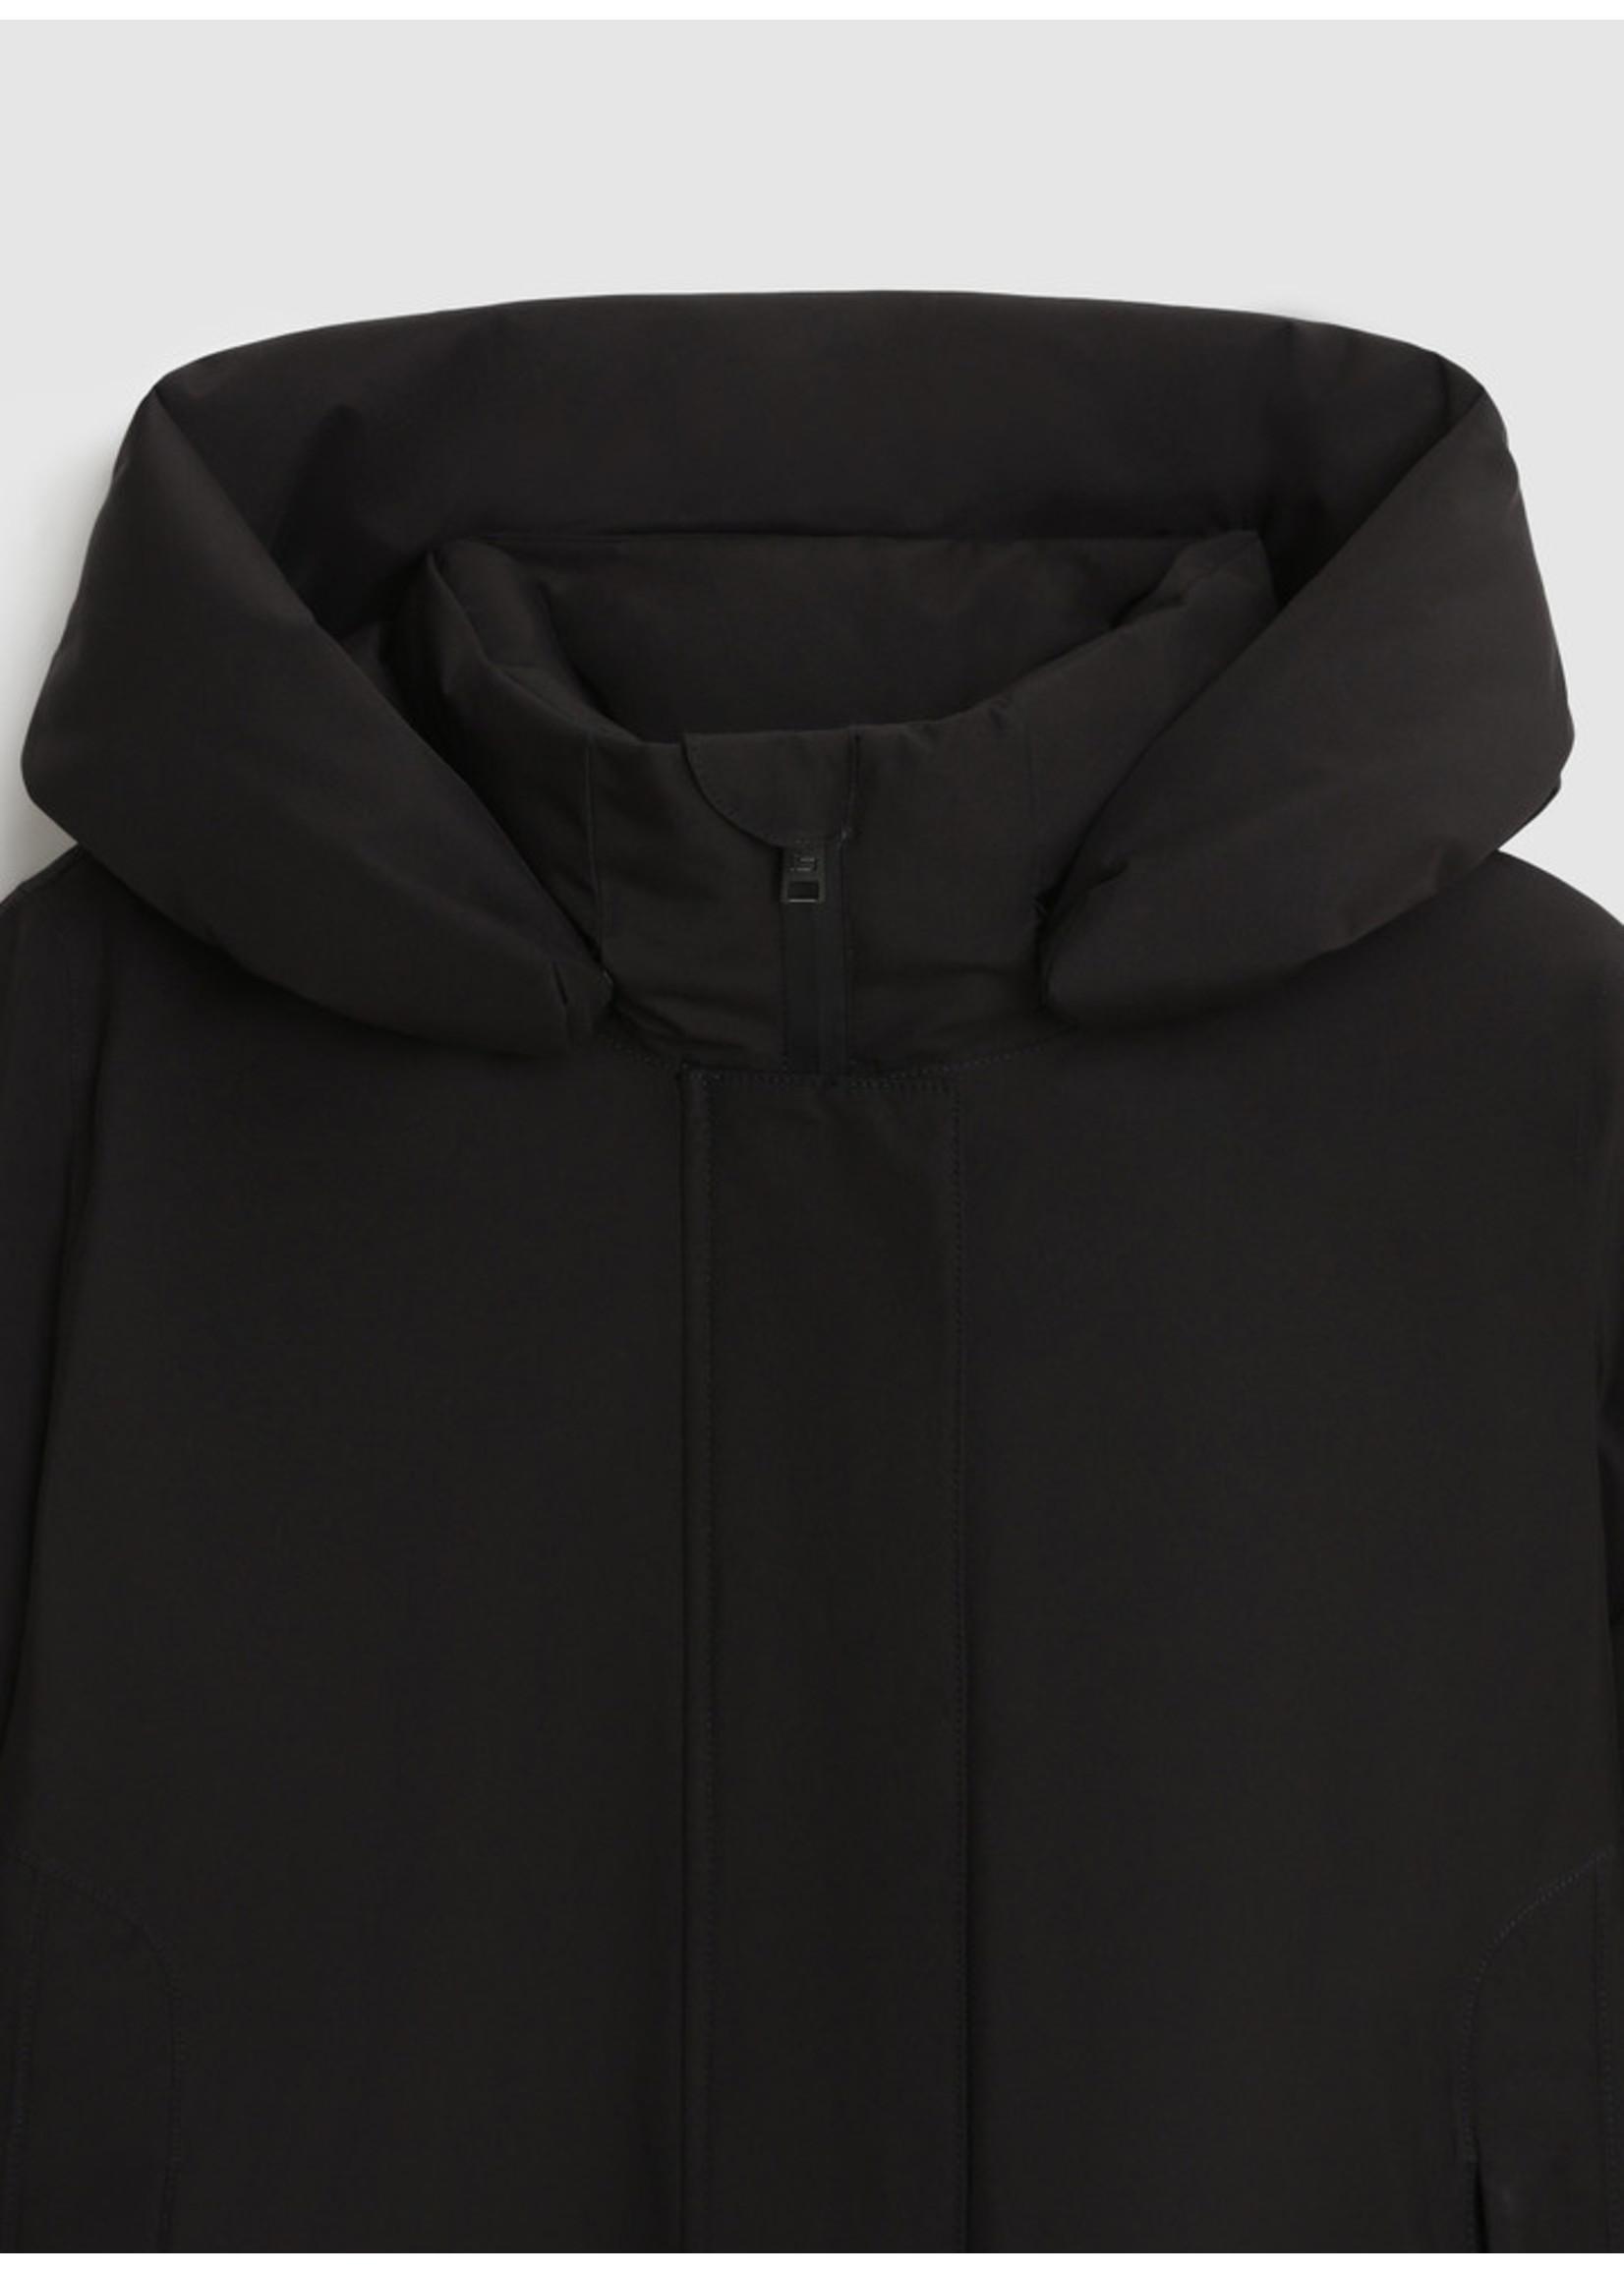 Woolrich Marshall Parka Black